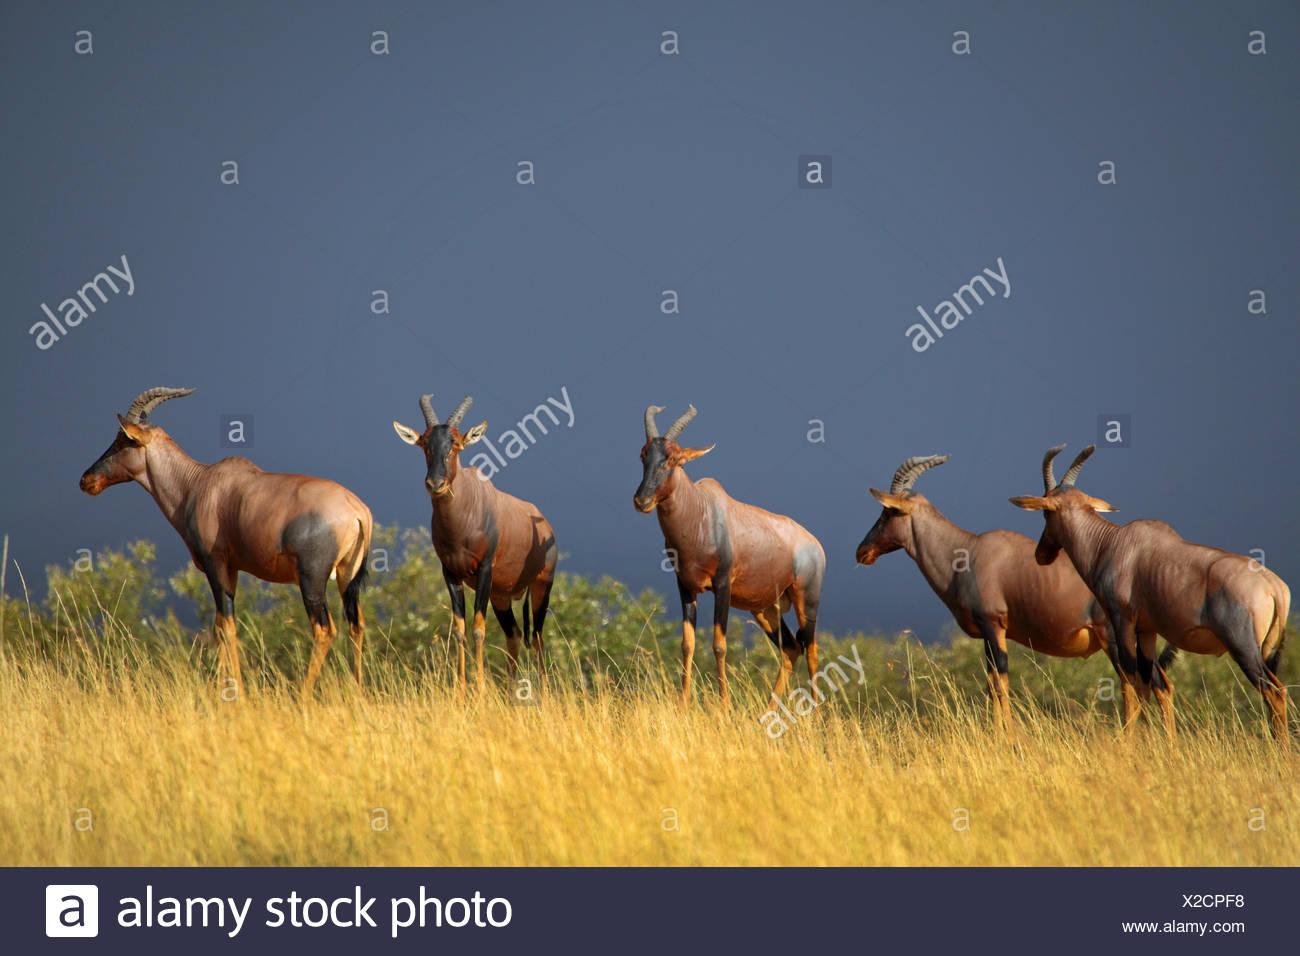 topi, tsessebi, korrigum, tsessebe (Damaliscus lunatus jimela), five topis standing together on high grass, Kenya, Masai Mara National Park - Stock Image